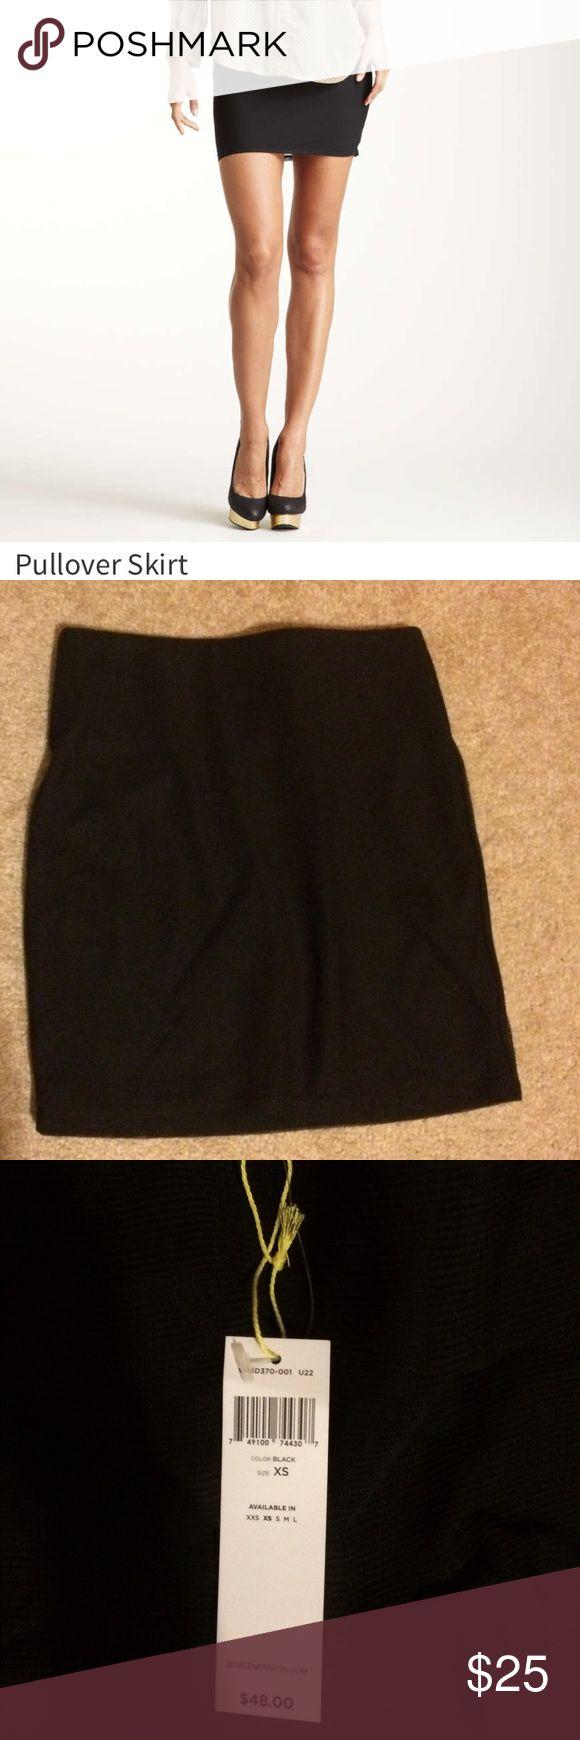 🎉🎉BCBGenerationblack skirt NWT NWT fold over black skirt BCBGeneration Skirts Mini